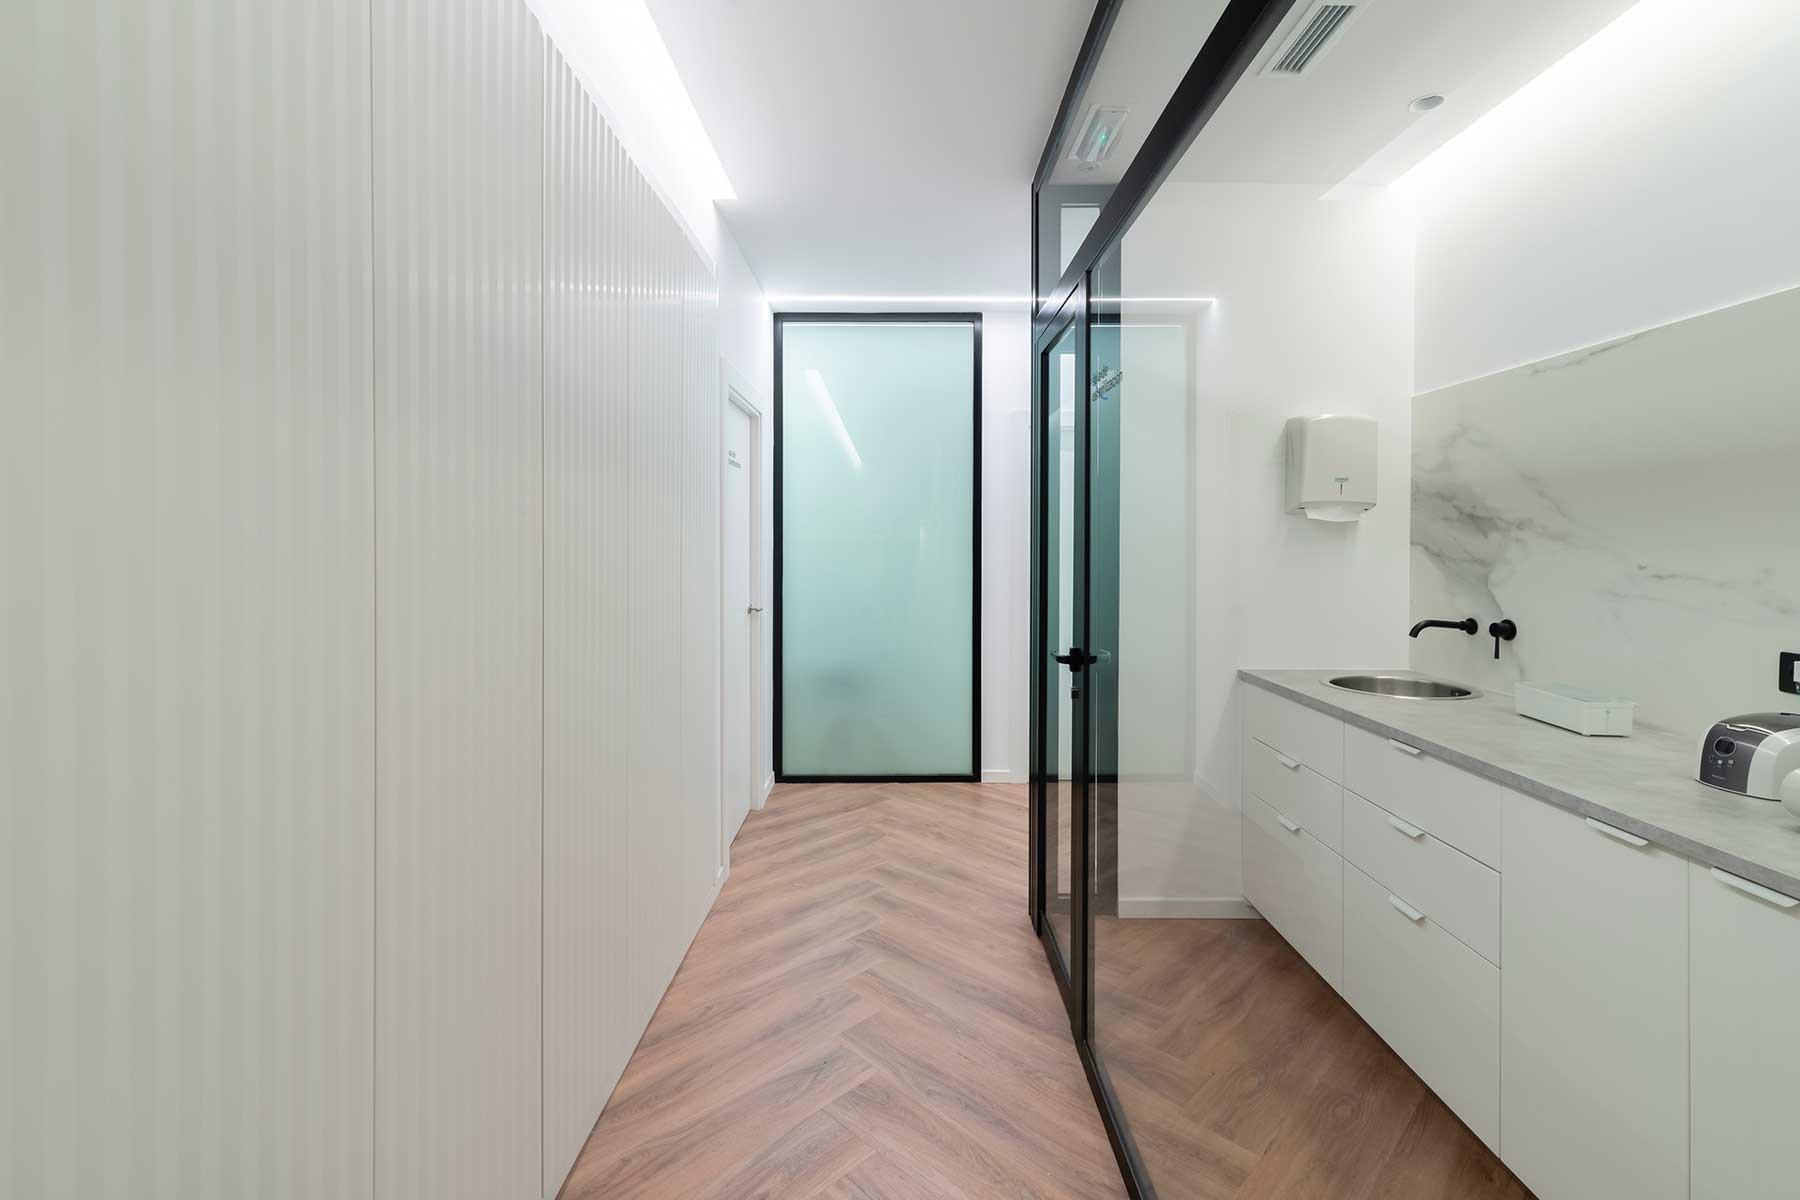 Clínica Dental | GMG arquitectura